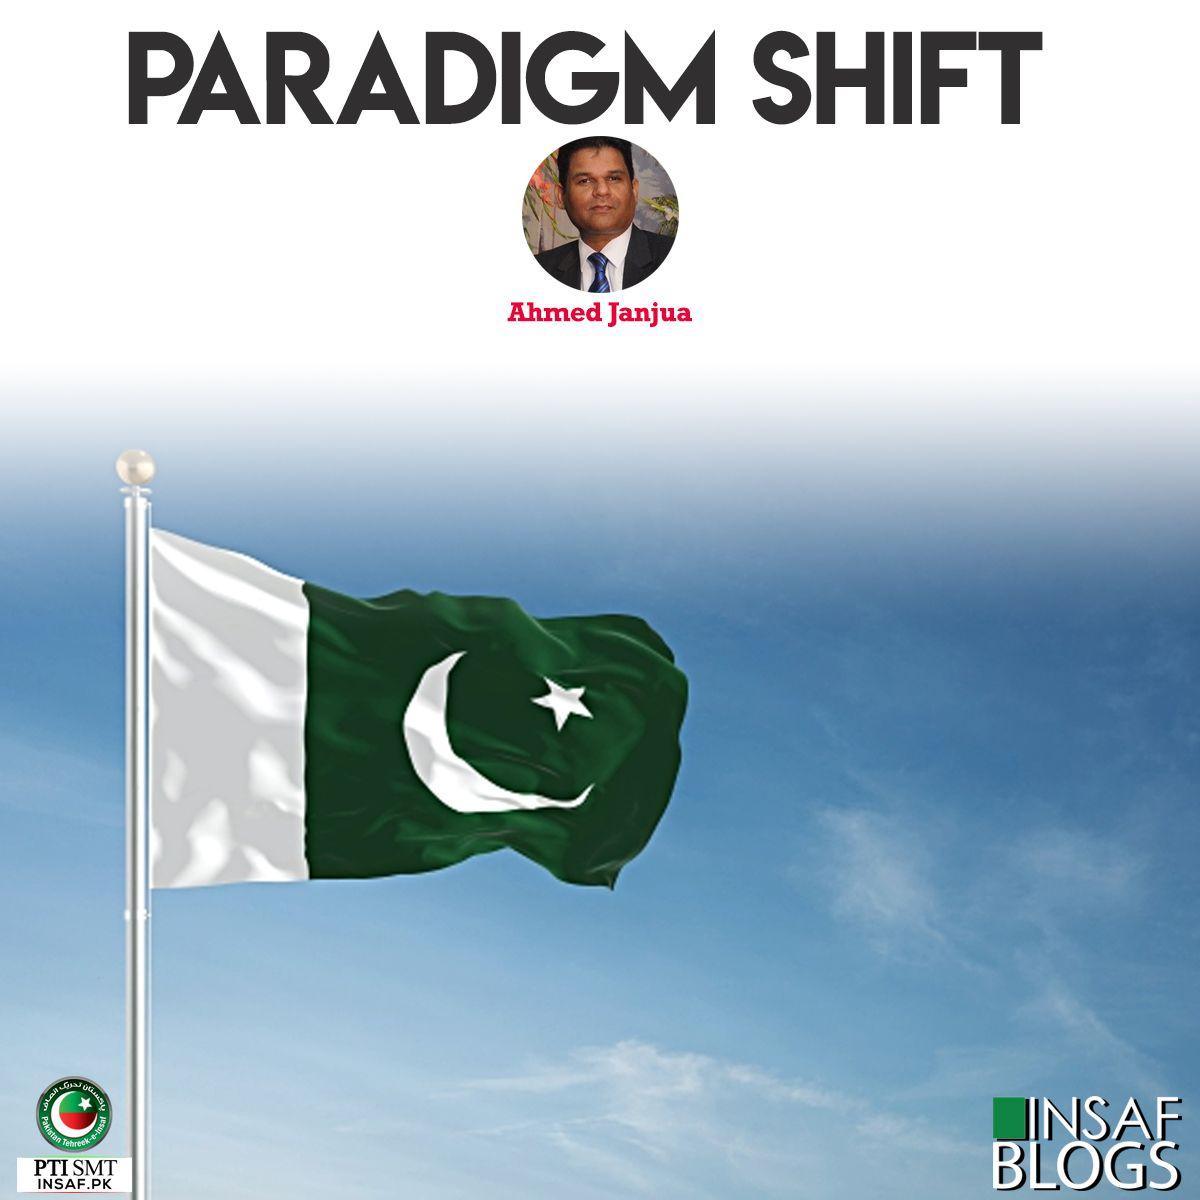 paradigm-shift-insaf-blog-ahmed-janjua